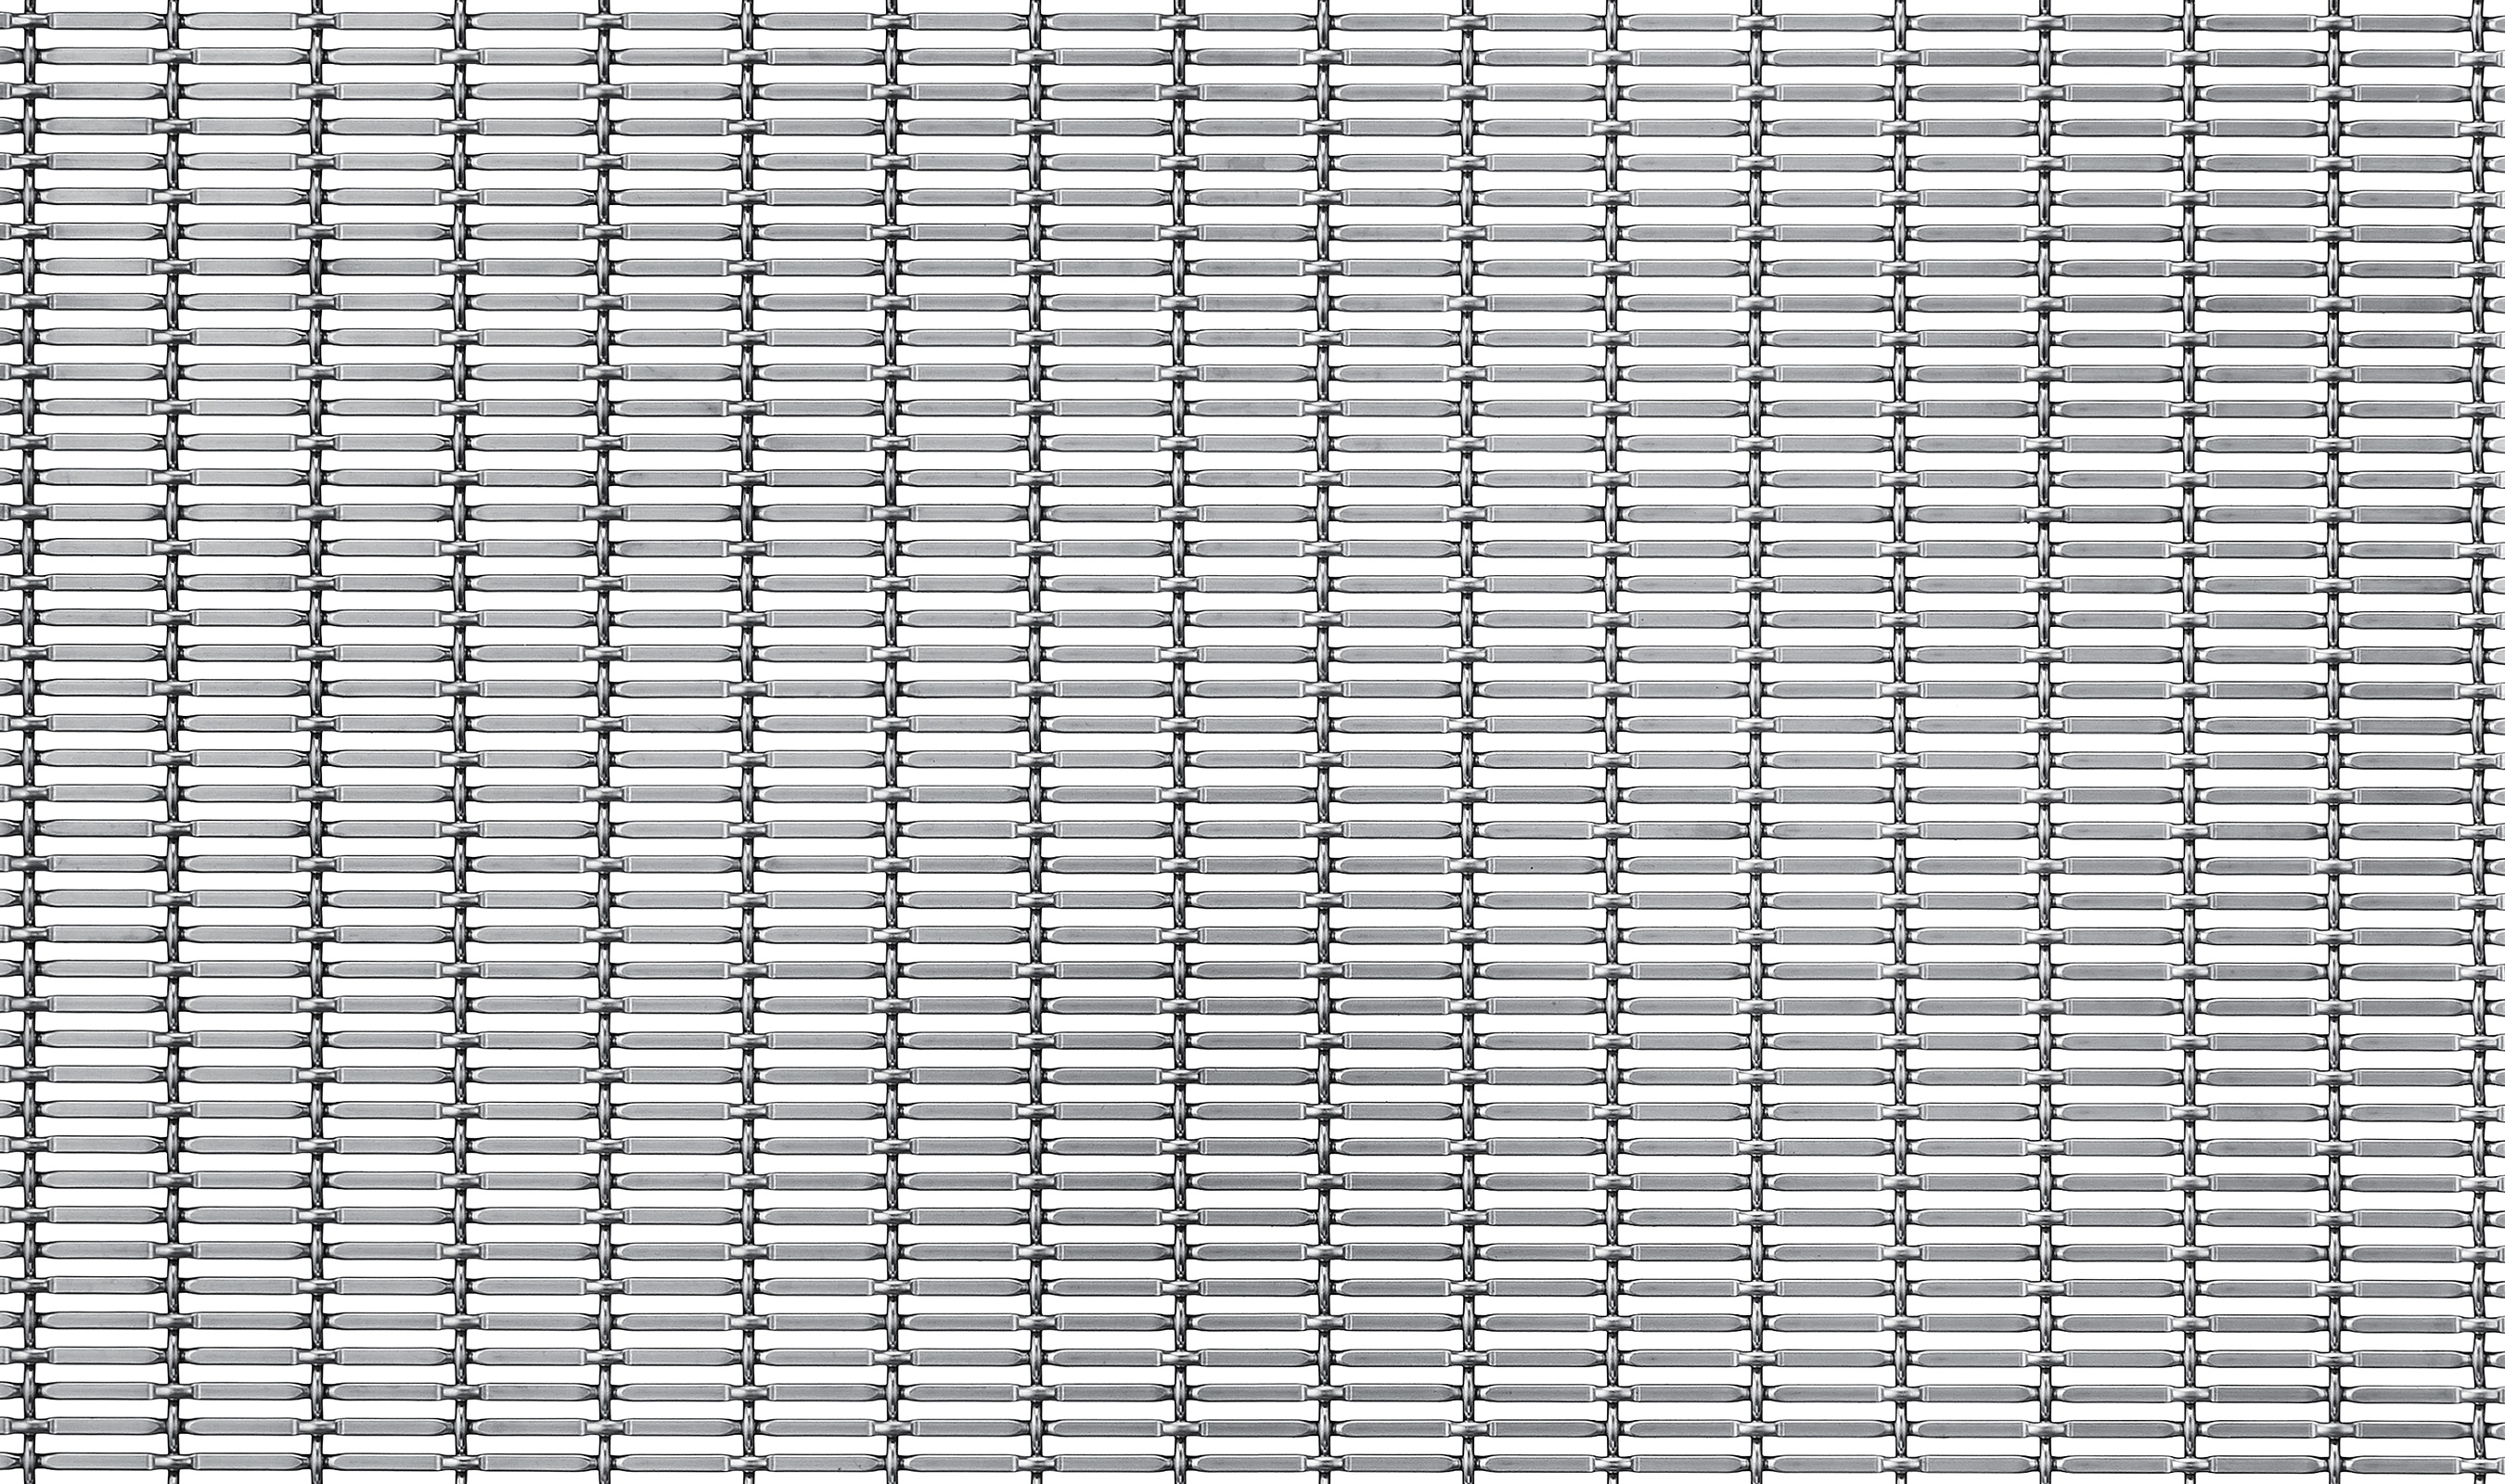 SPZ-52 Stainless Steel wire mesh pattern